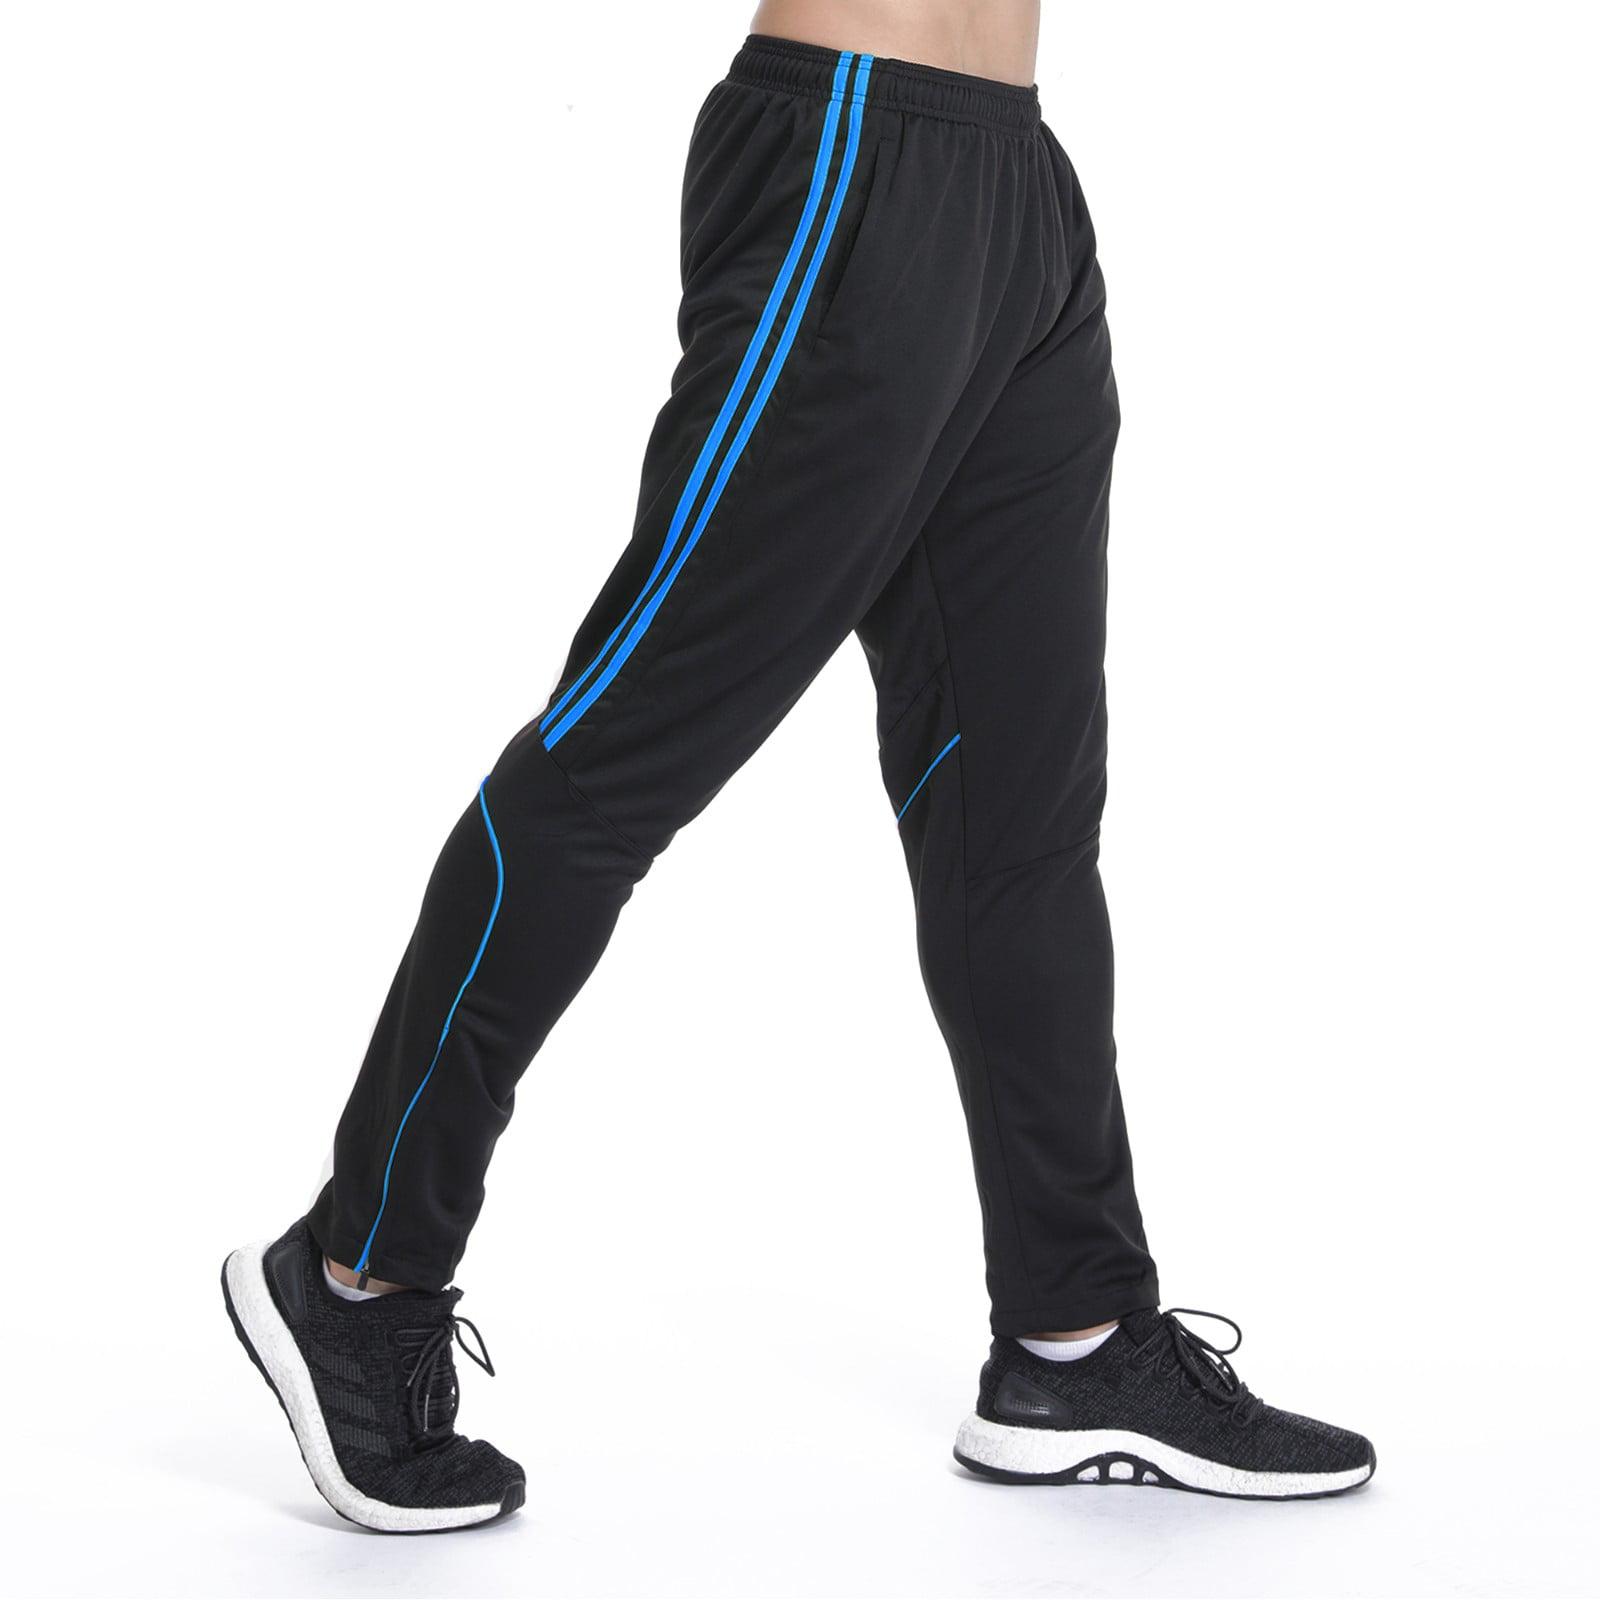 Legou Mens Solid Colors Breathable Athletic Jogger Sweatpants